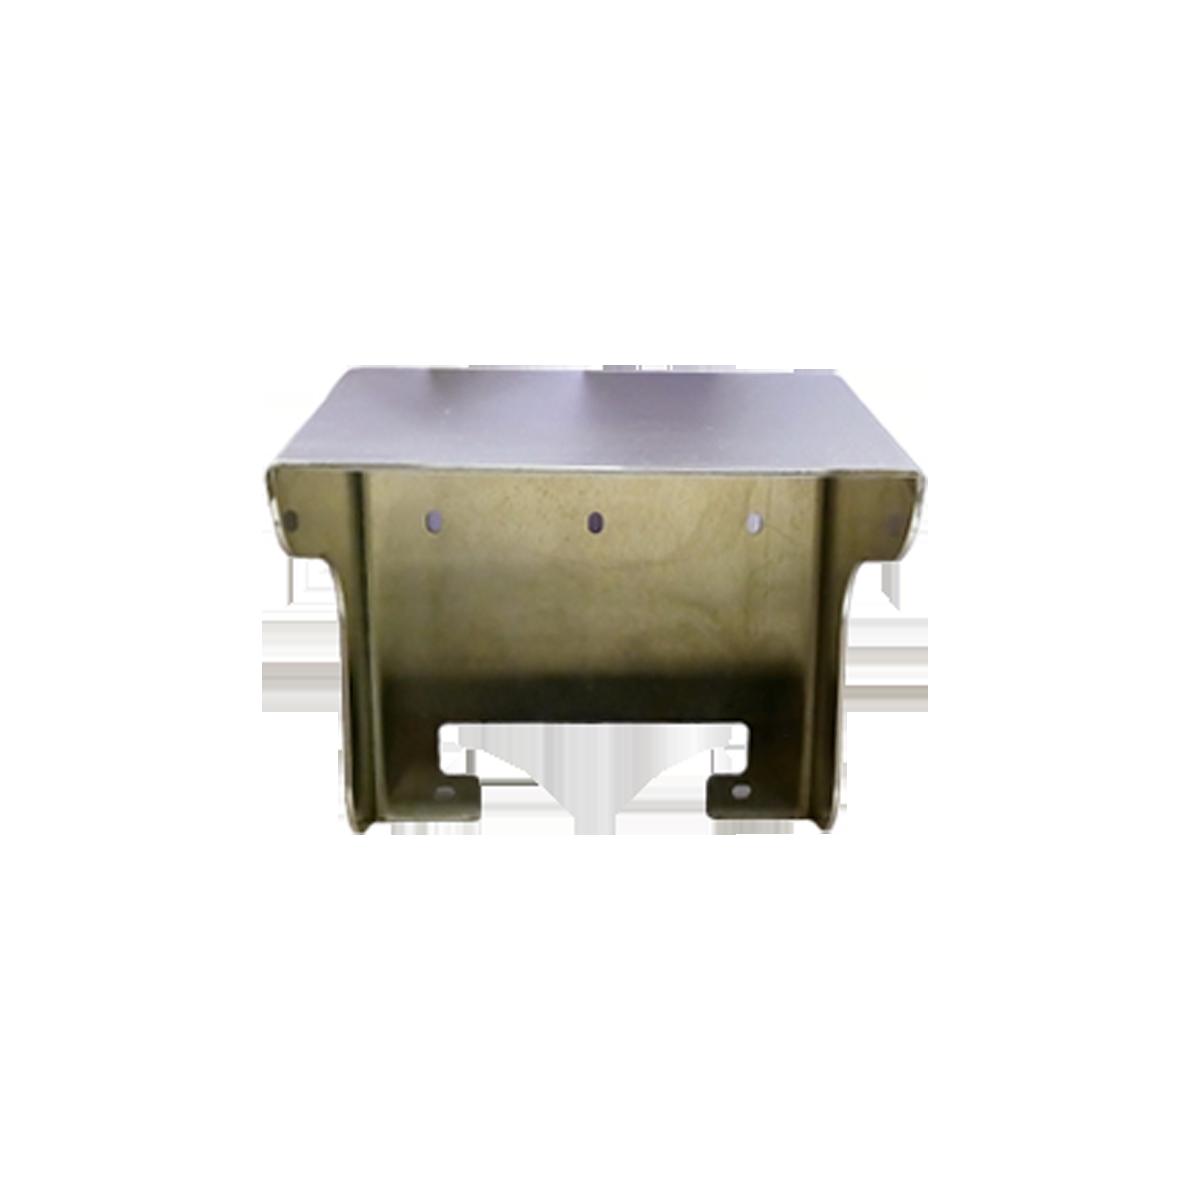 Proteção de metal para 2 módulos Mini